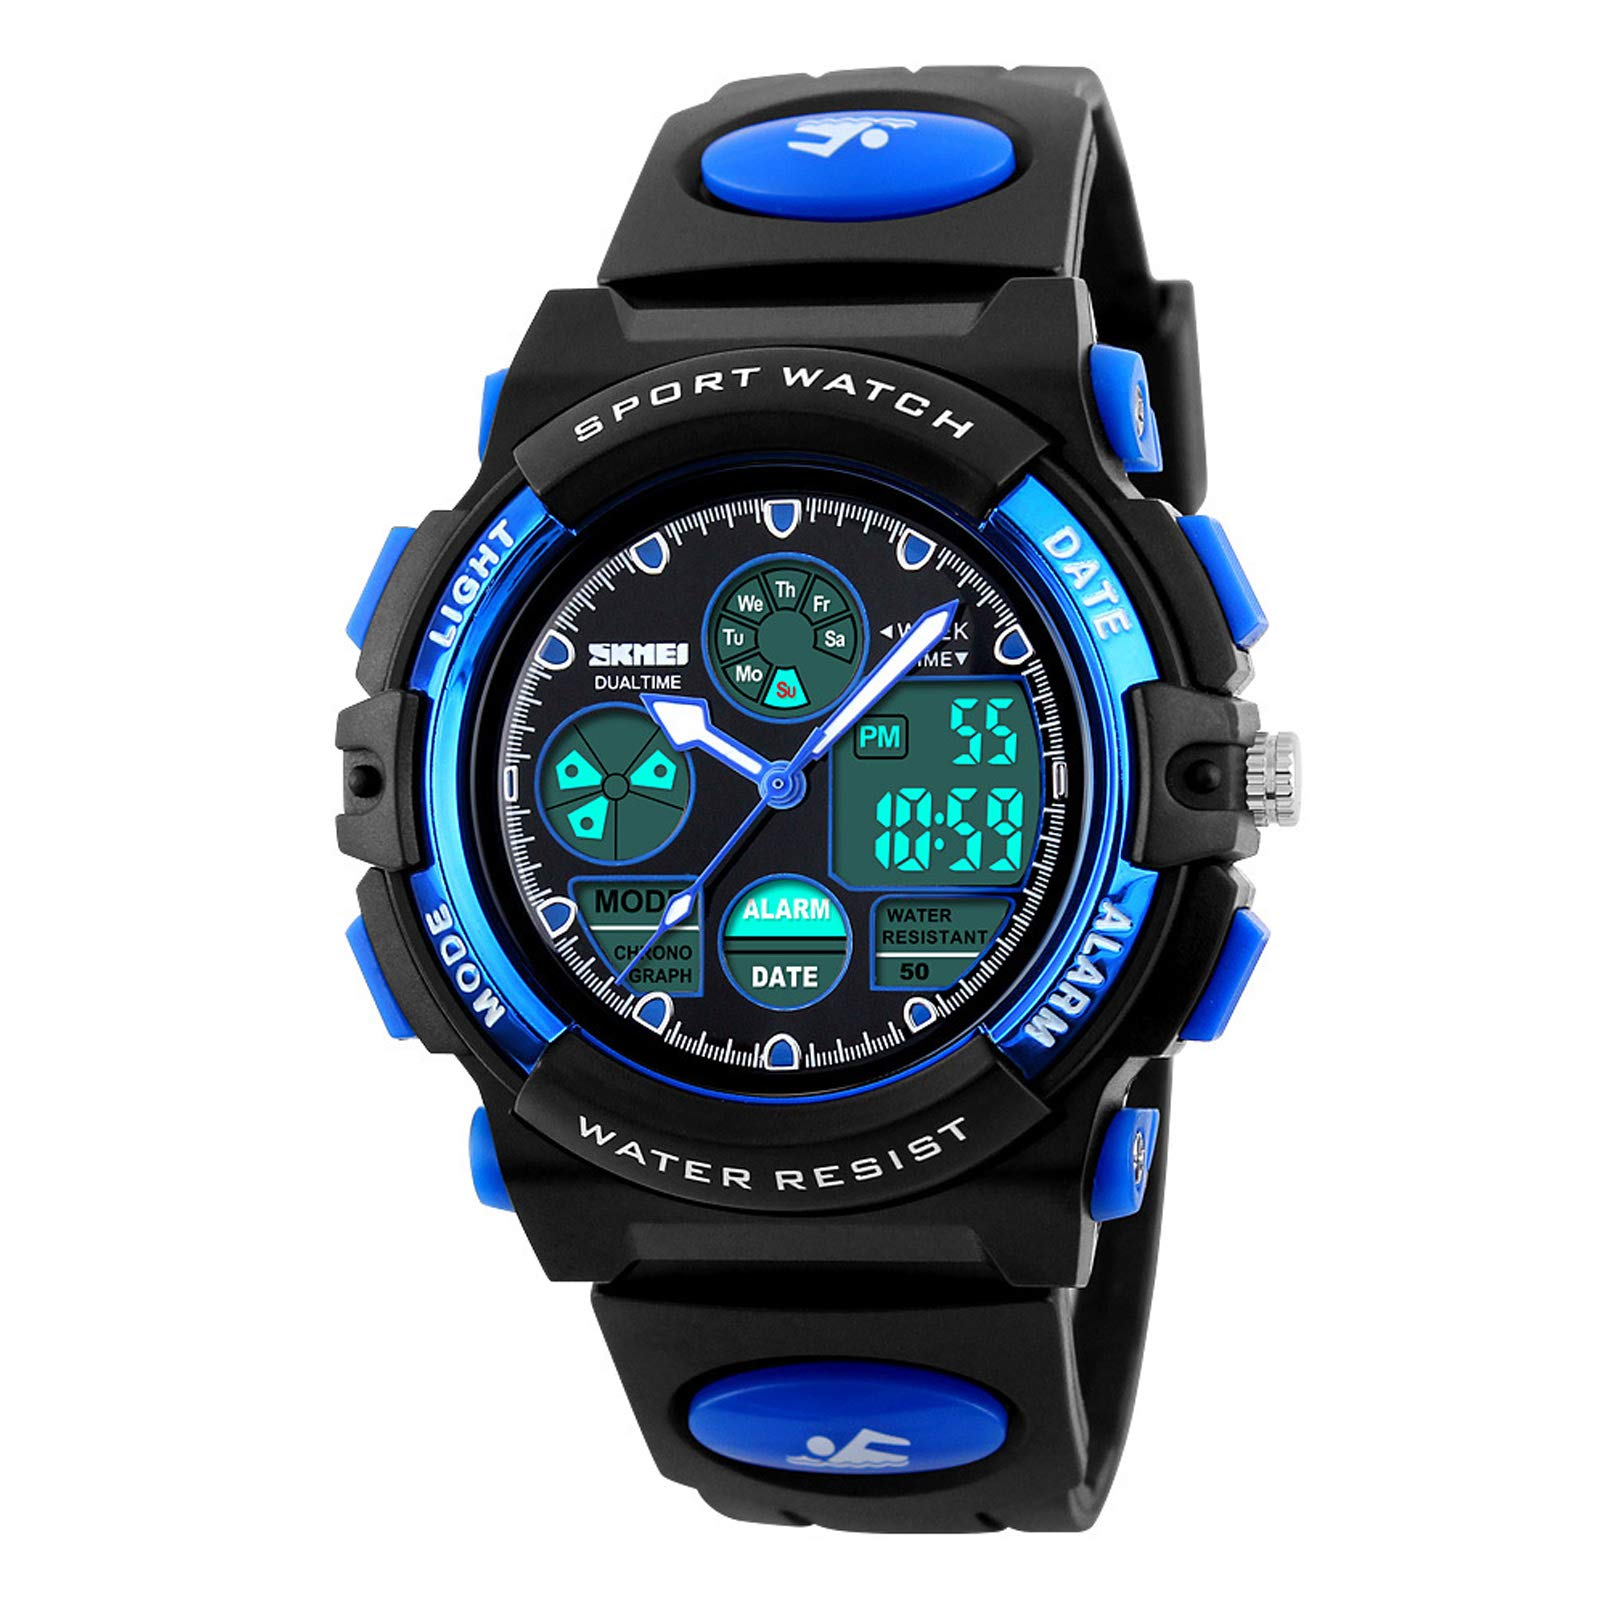 eYotto Kids Sports Watch Waterproof Boys Multi-Function Analog Digital Wristwatch LED Alarm Stopwatch Blue by eYotto